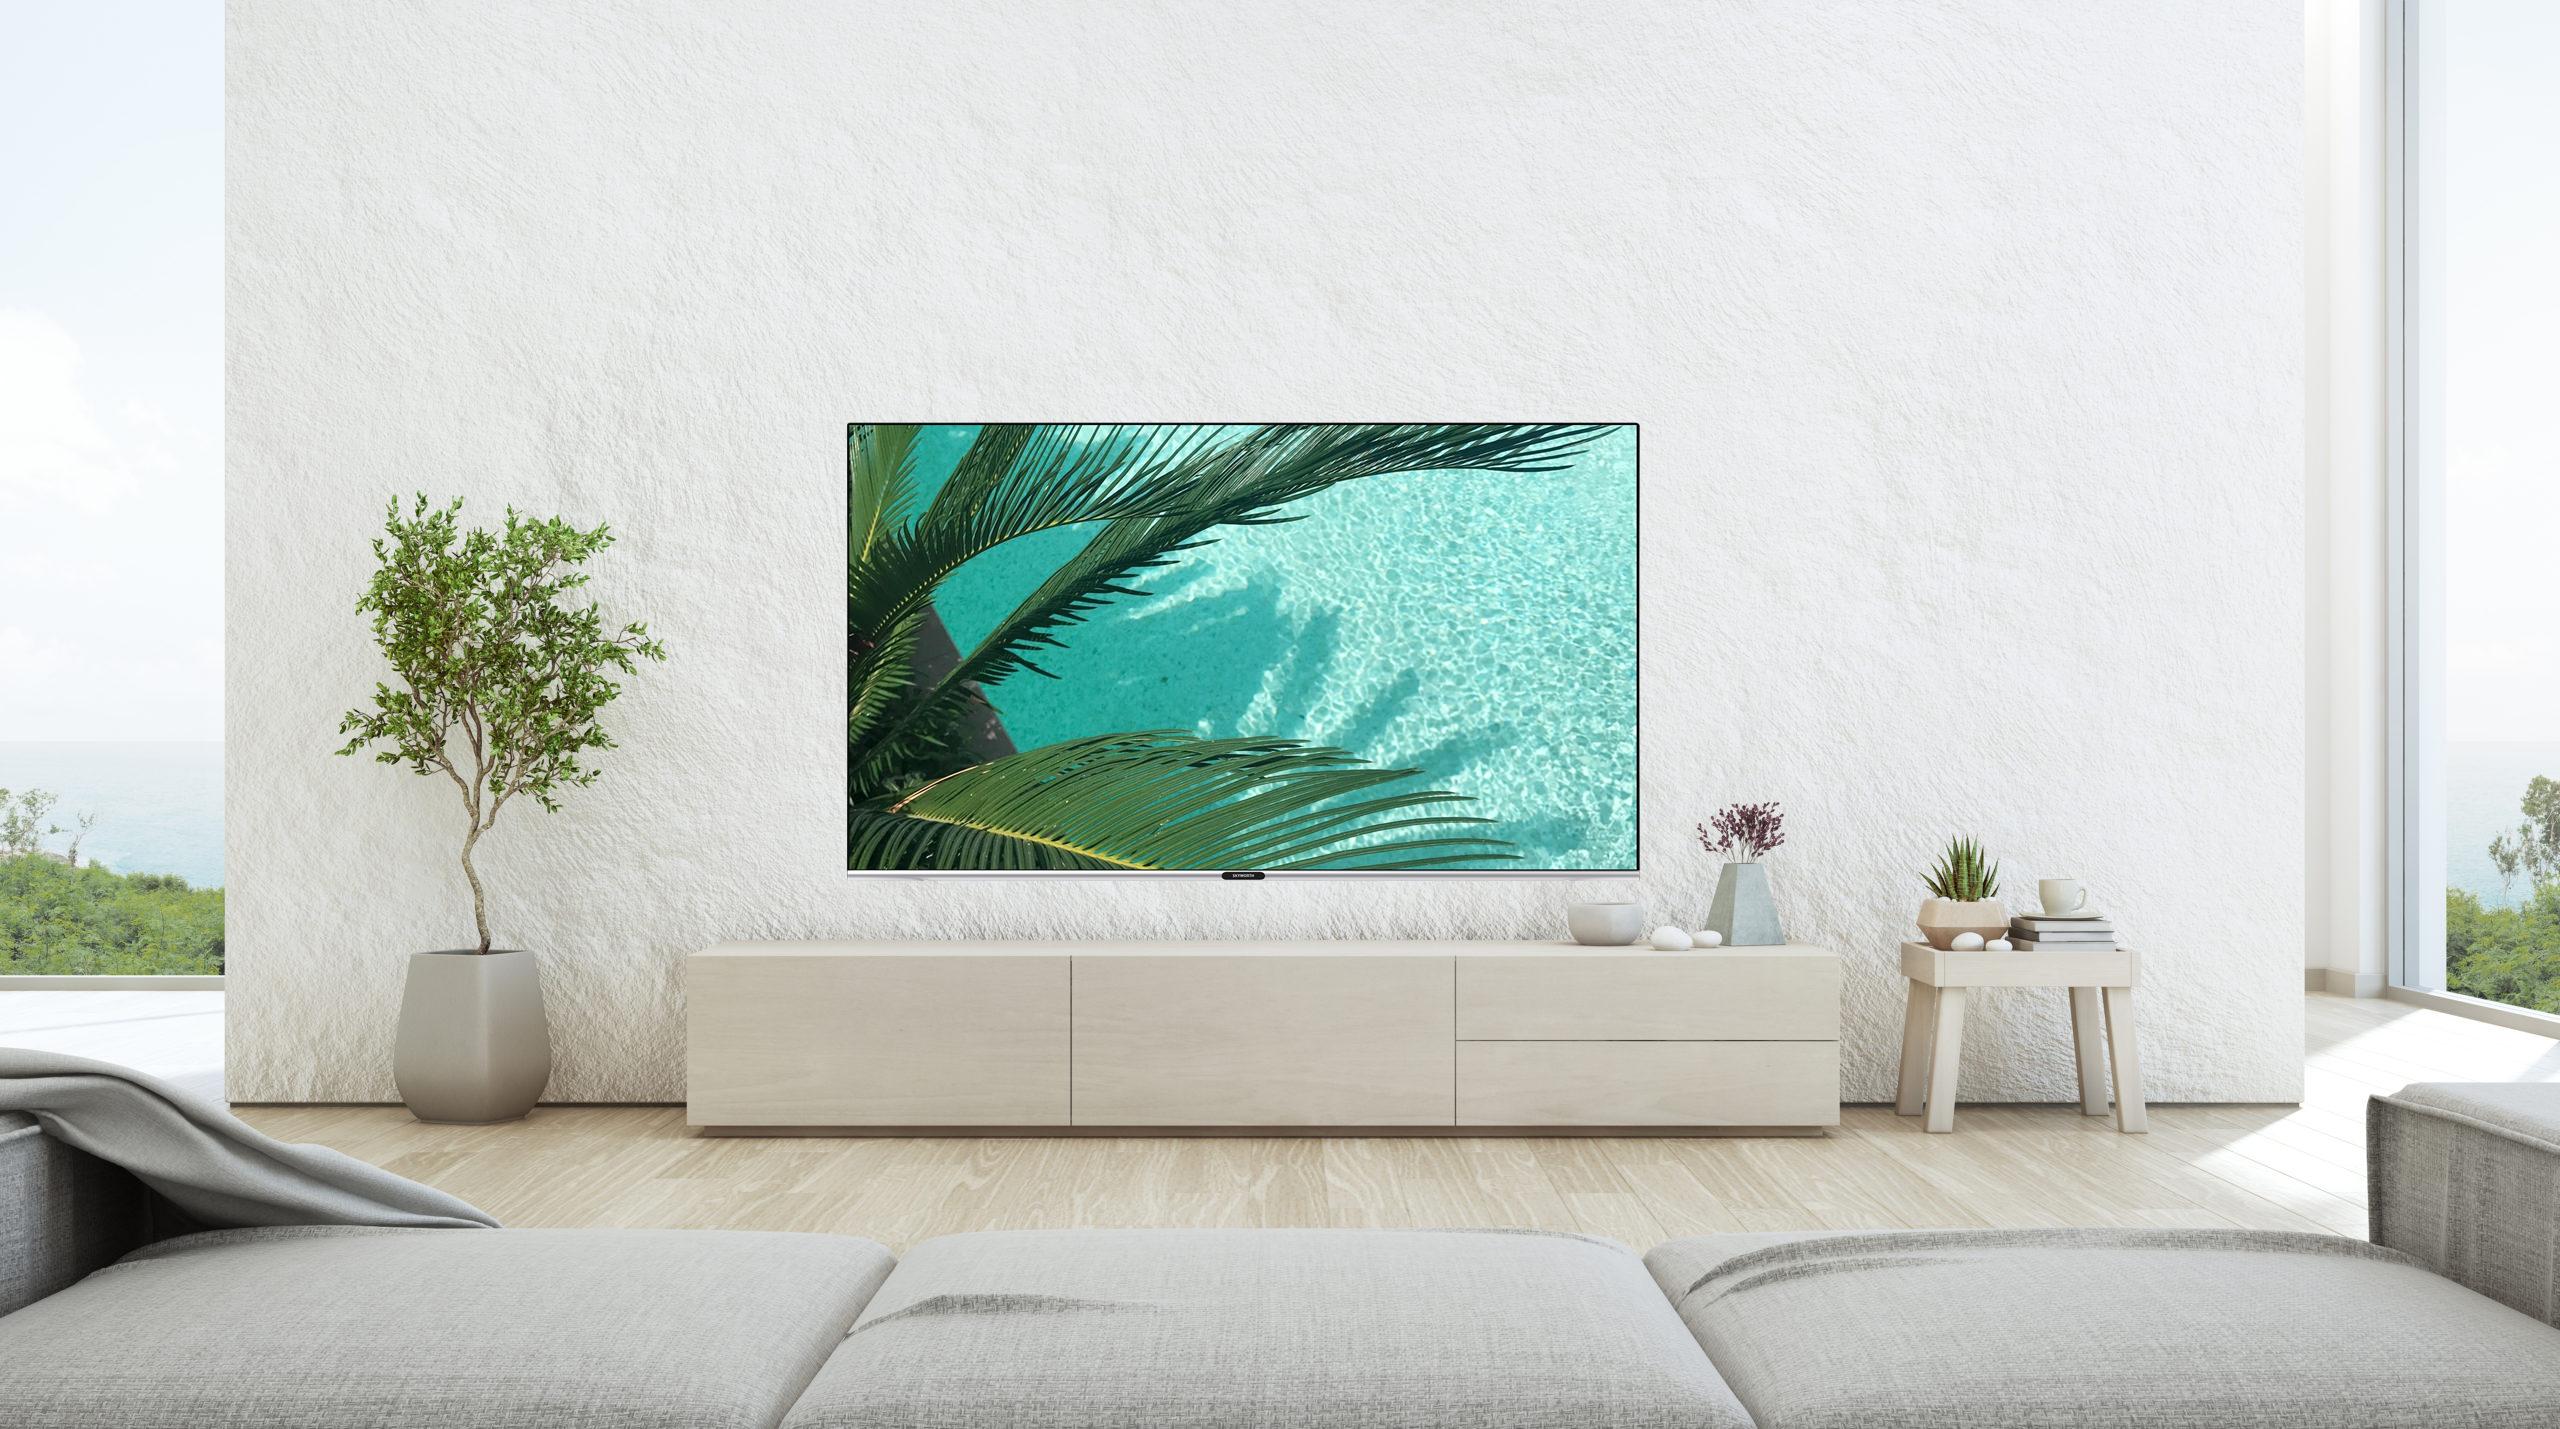 🖥️ Skyworth rozpočala oficijni prodaži 4K-televizora Q20 AIoT Dolby Vision v Ukraїni